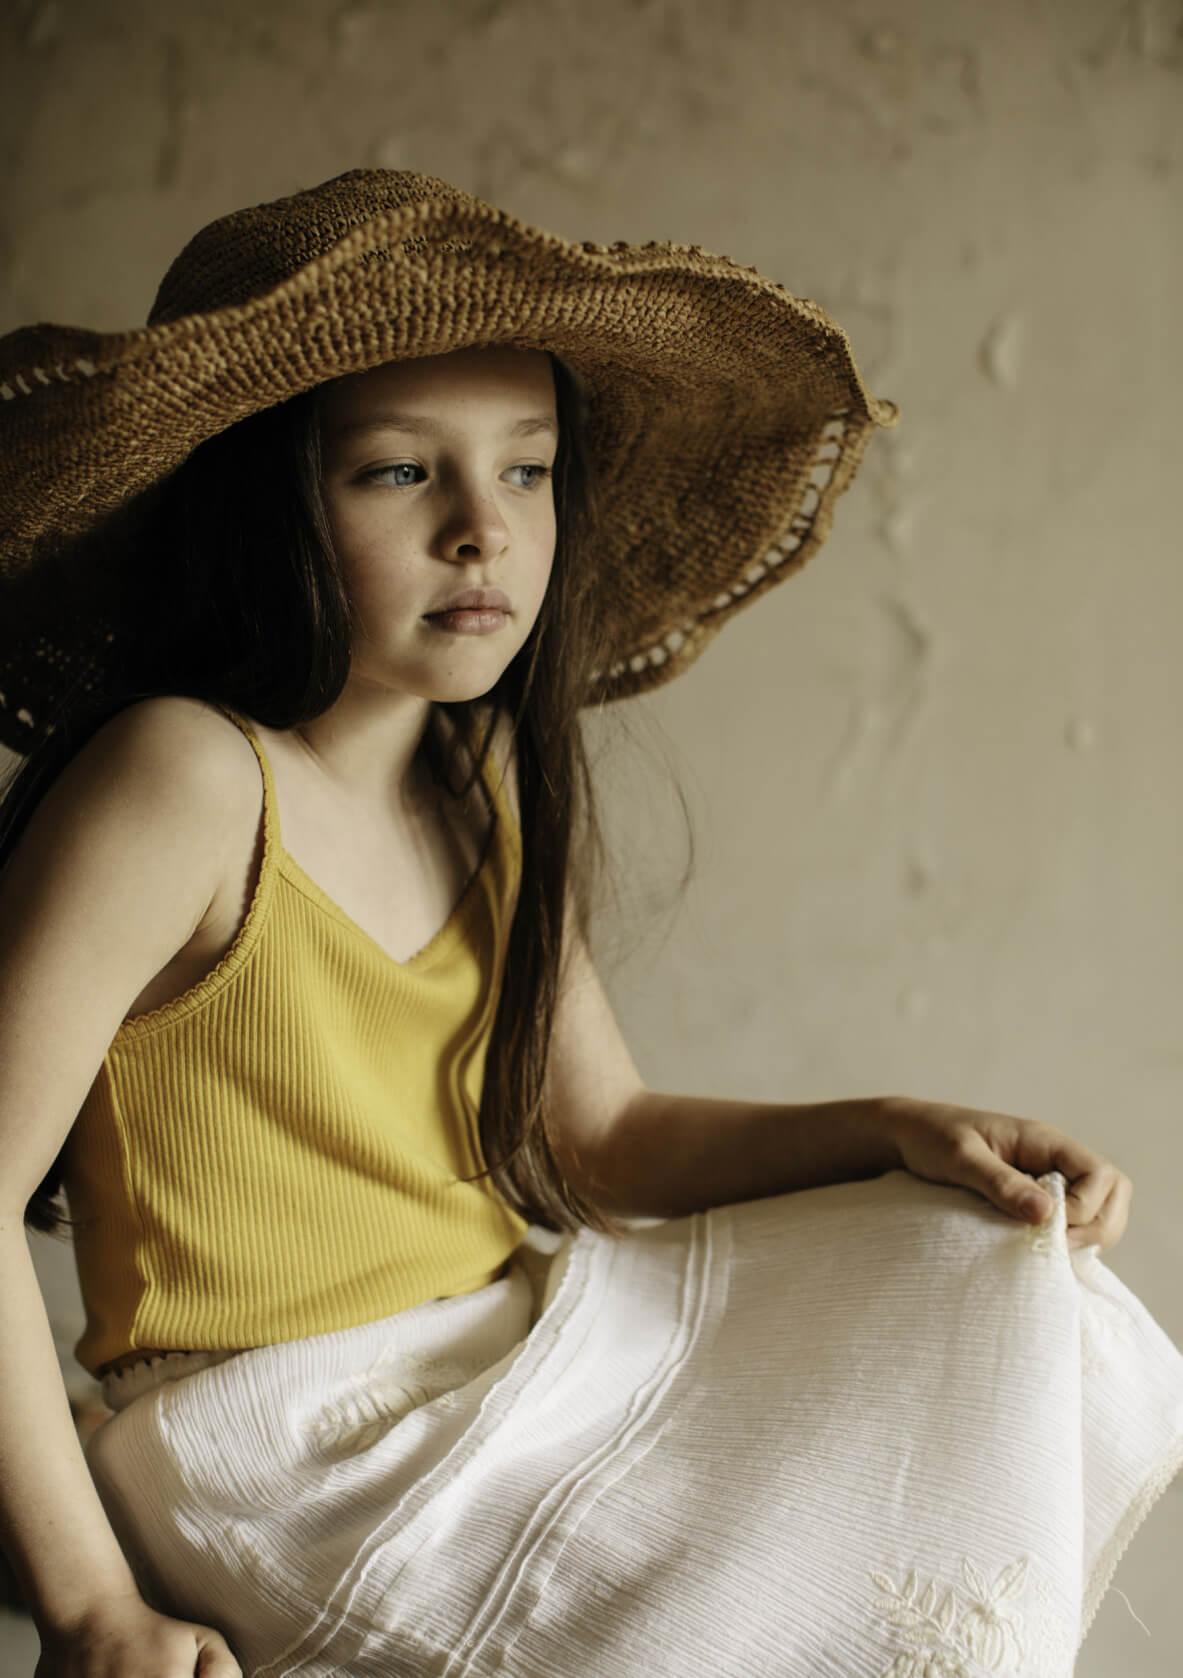 French children's clothing